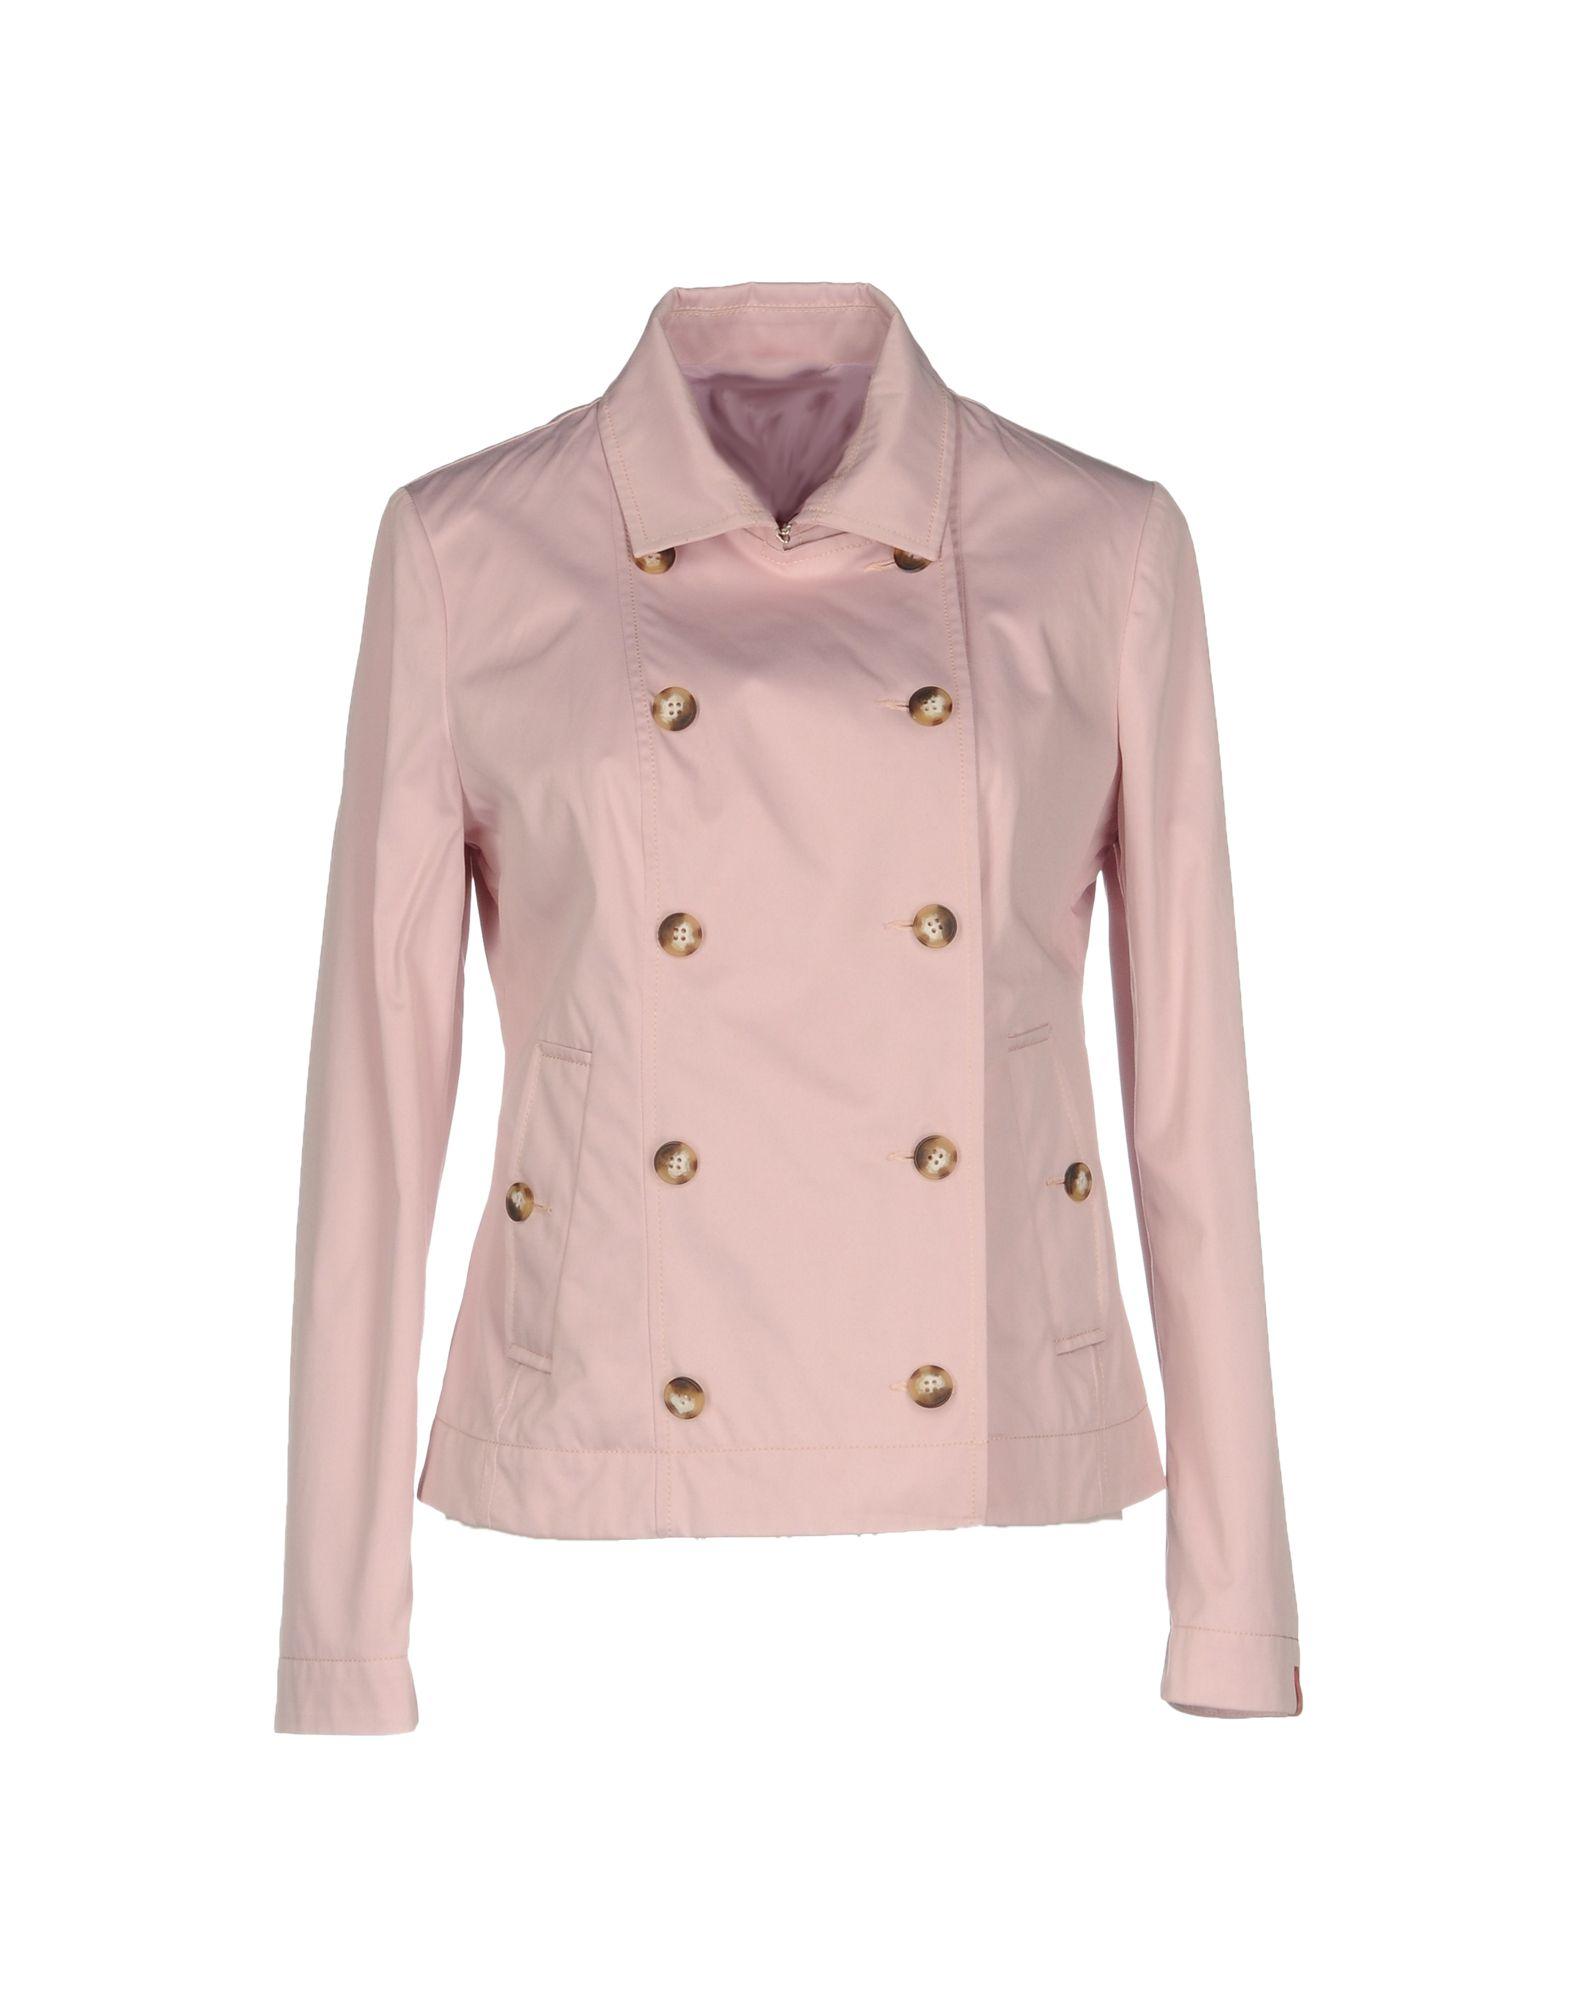 лучшая цена 313 TRE UNO TRE Куртка